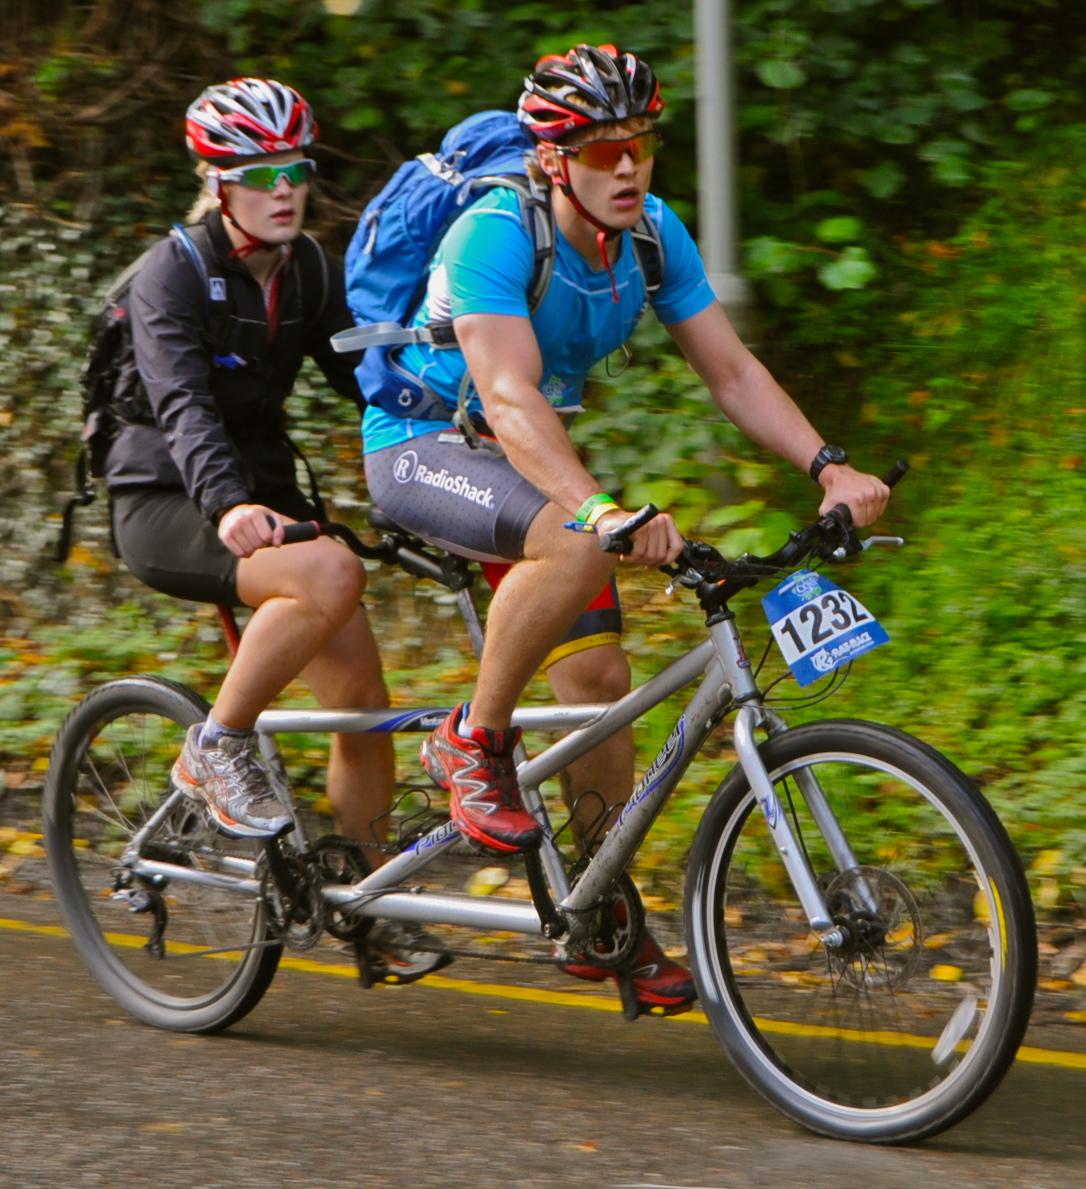 scotland_coast_to_coast_cycling_tandem